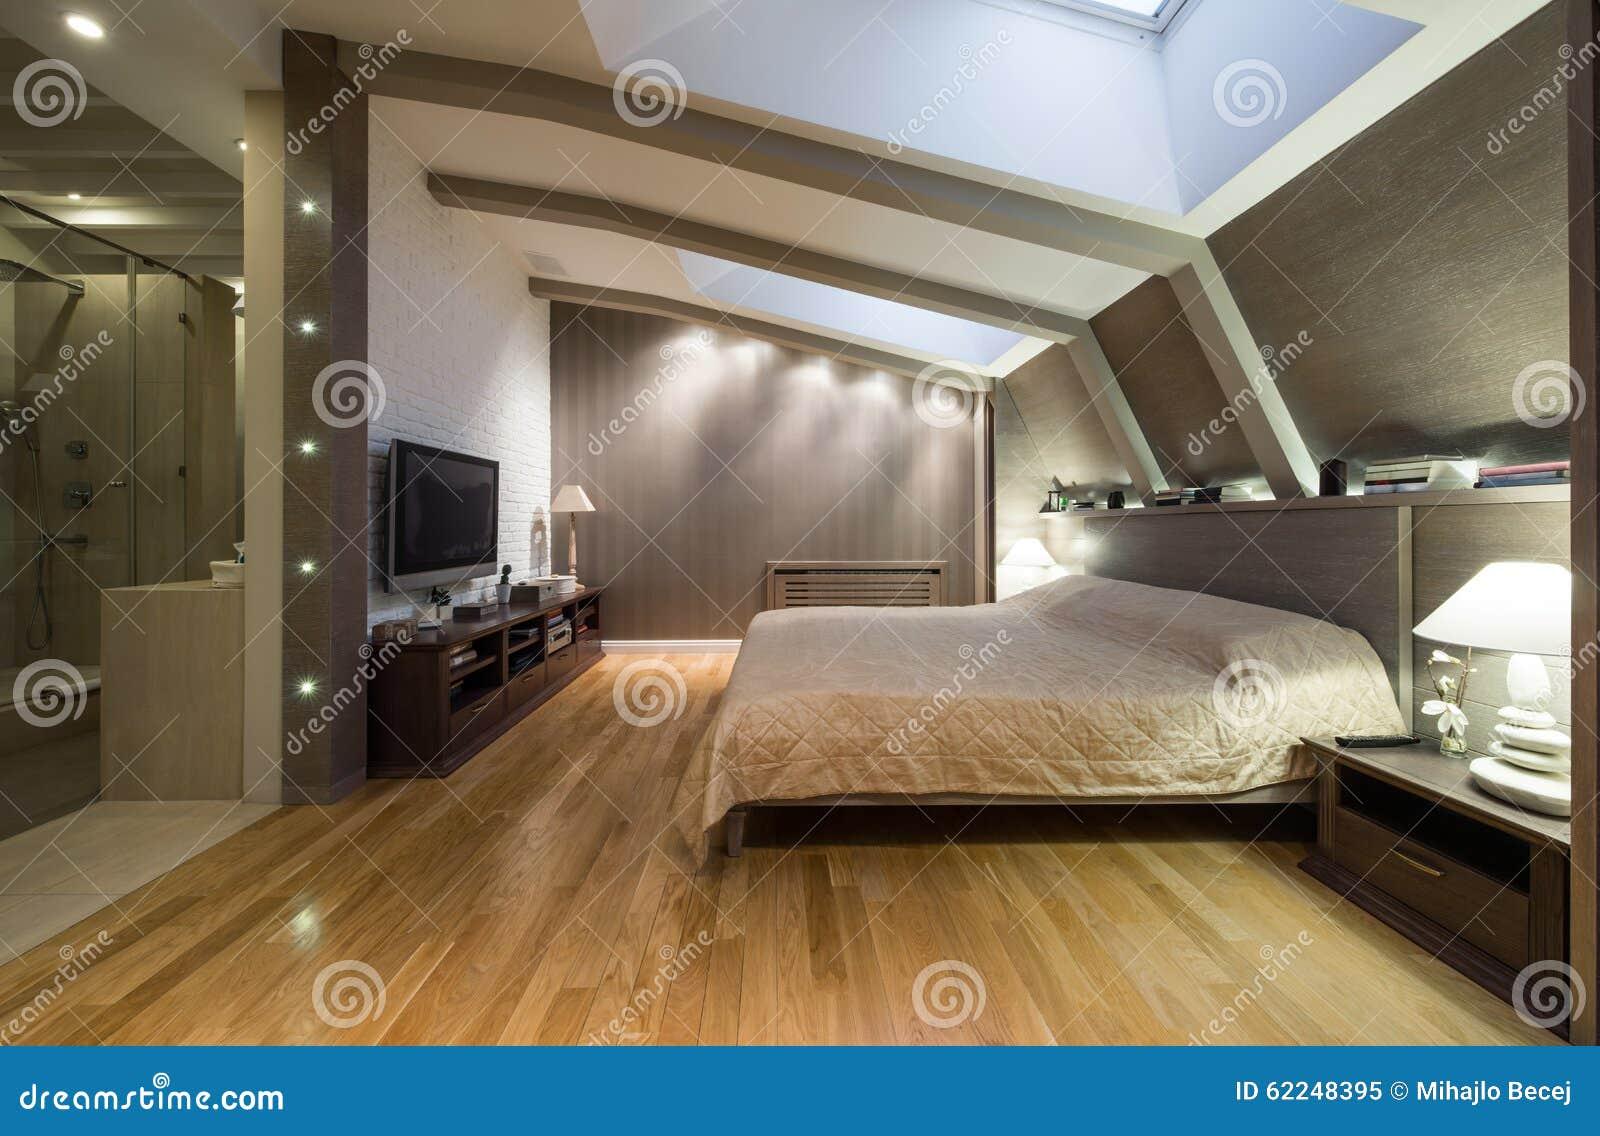 chambre coucher de grenier avec la salle de bains priv e photo stock image 62248395. Black Bedroom Furniture Sets. Home Design Ideas